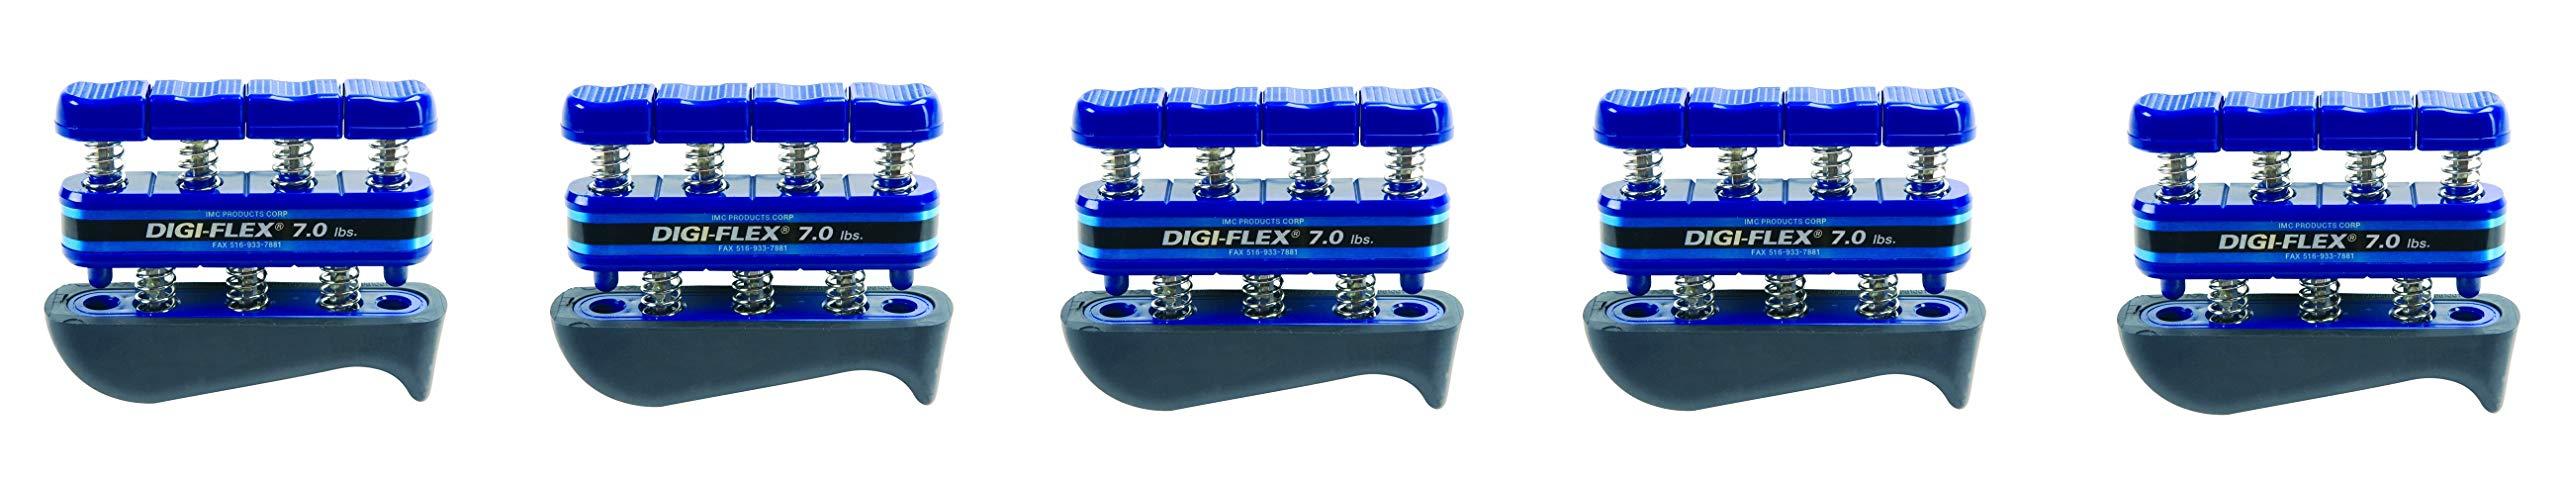 Digi-Flex Blue Hand and Finger Exercise System, 7 lbs Resistance (5-Pack)